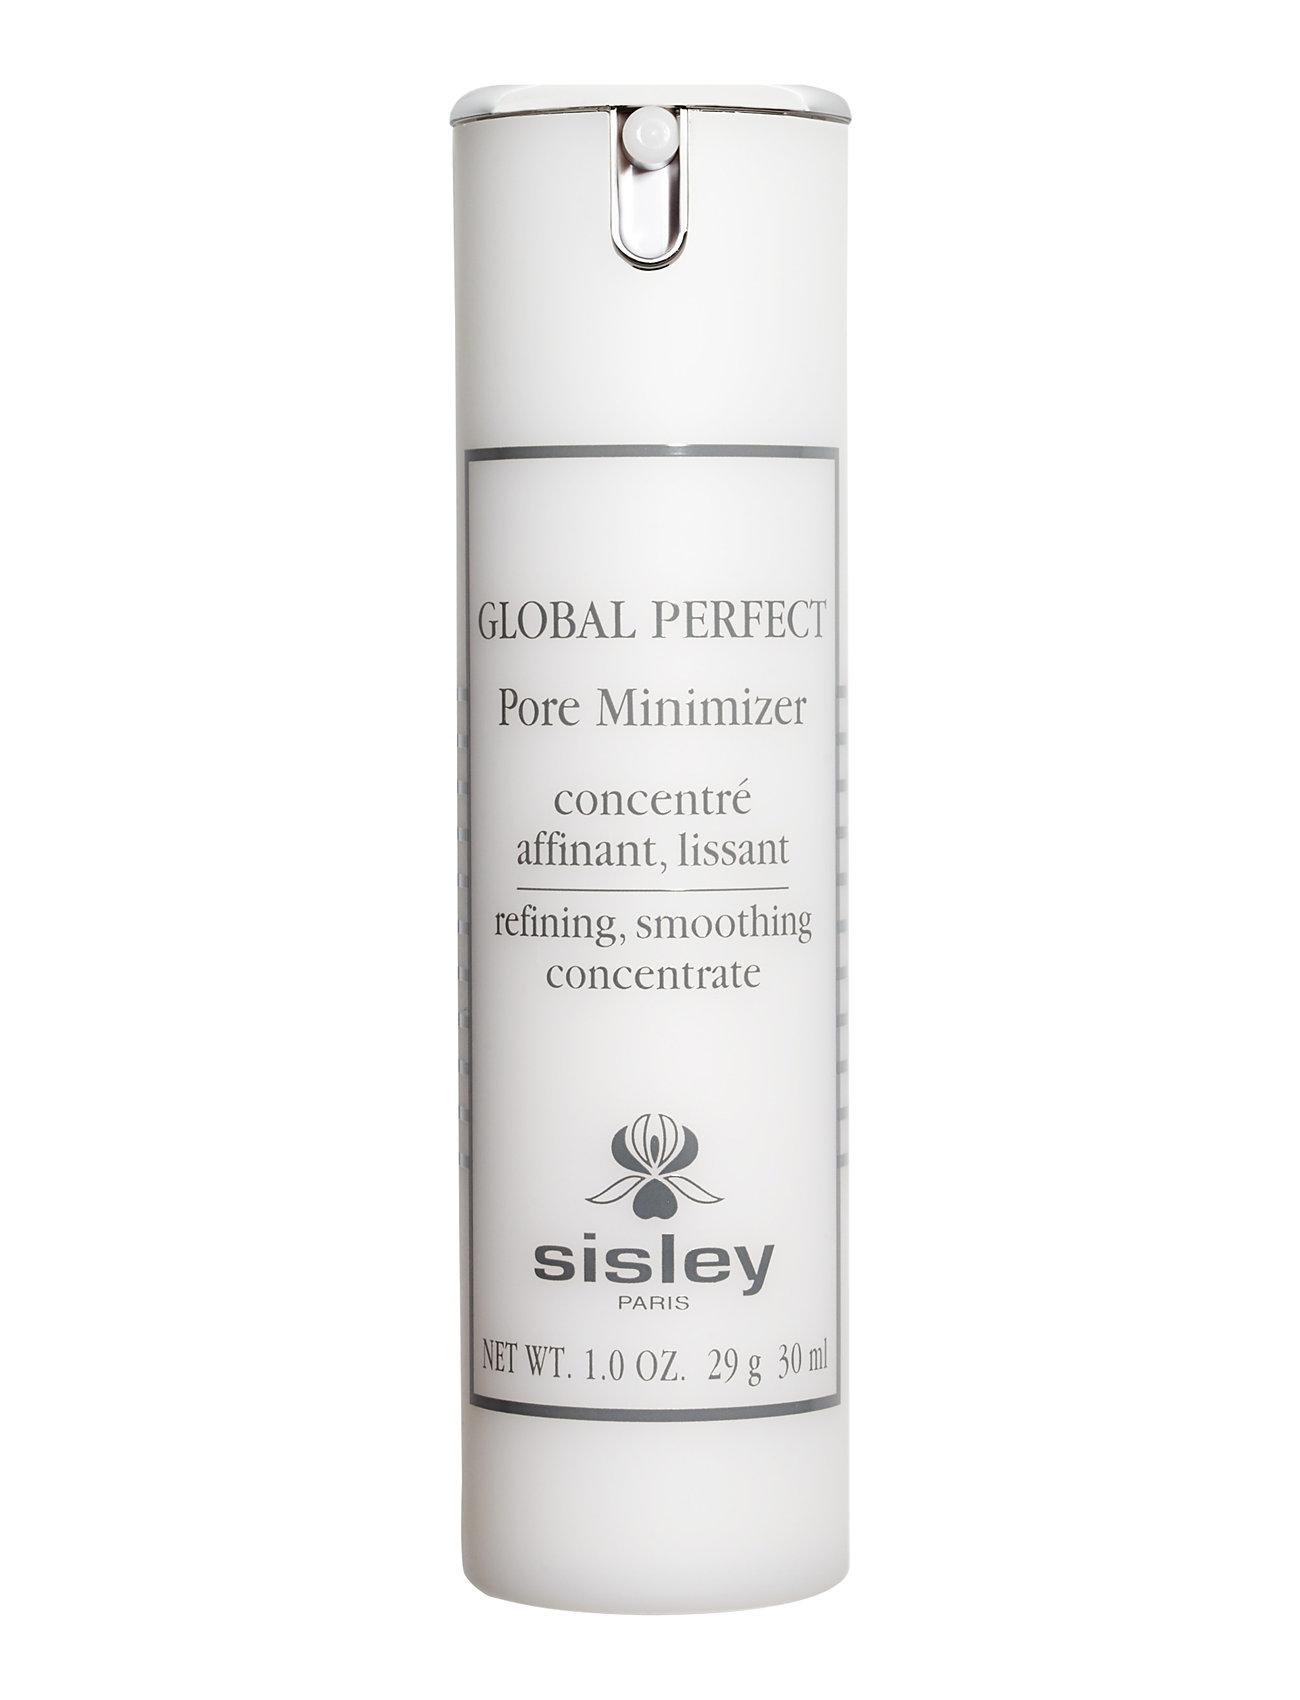 Sisley GLOBAL PERFECT PORE MINIMIZER 30ml - CLEAR